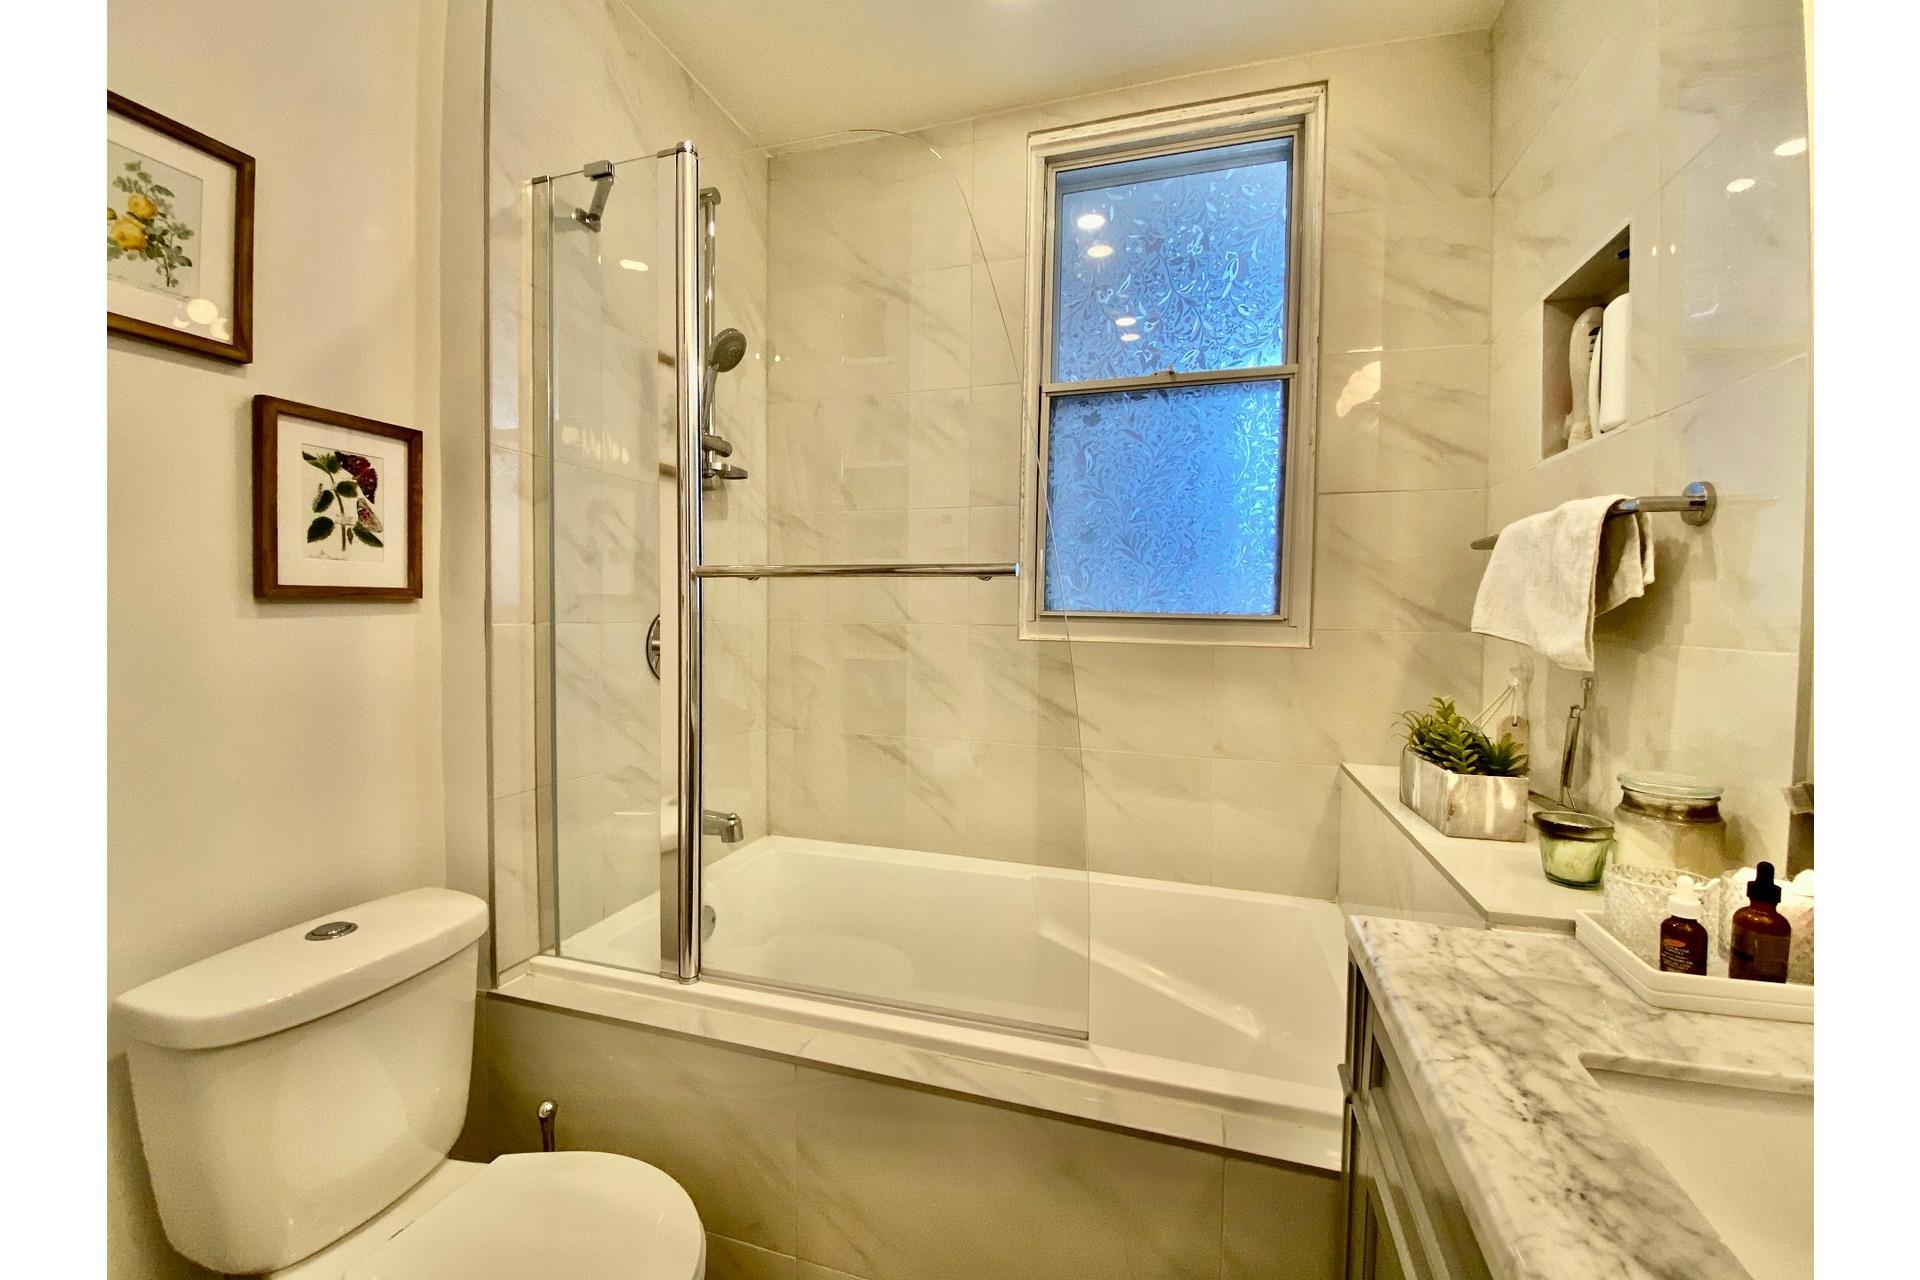 image 17 - Duplex En venta Lachine Montréal  - 6 habitaciones